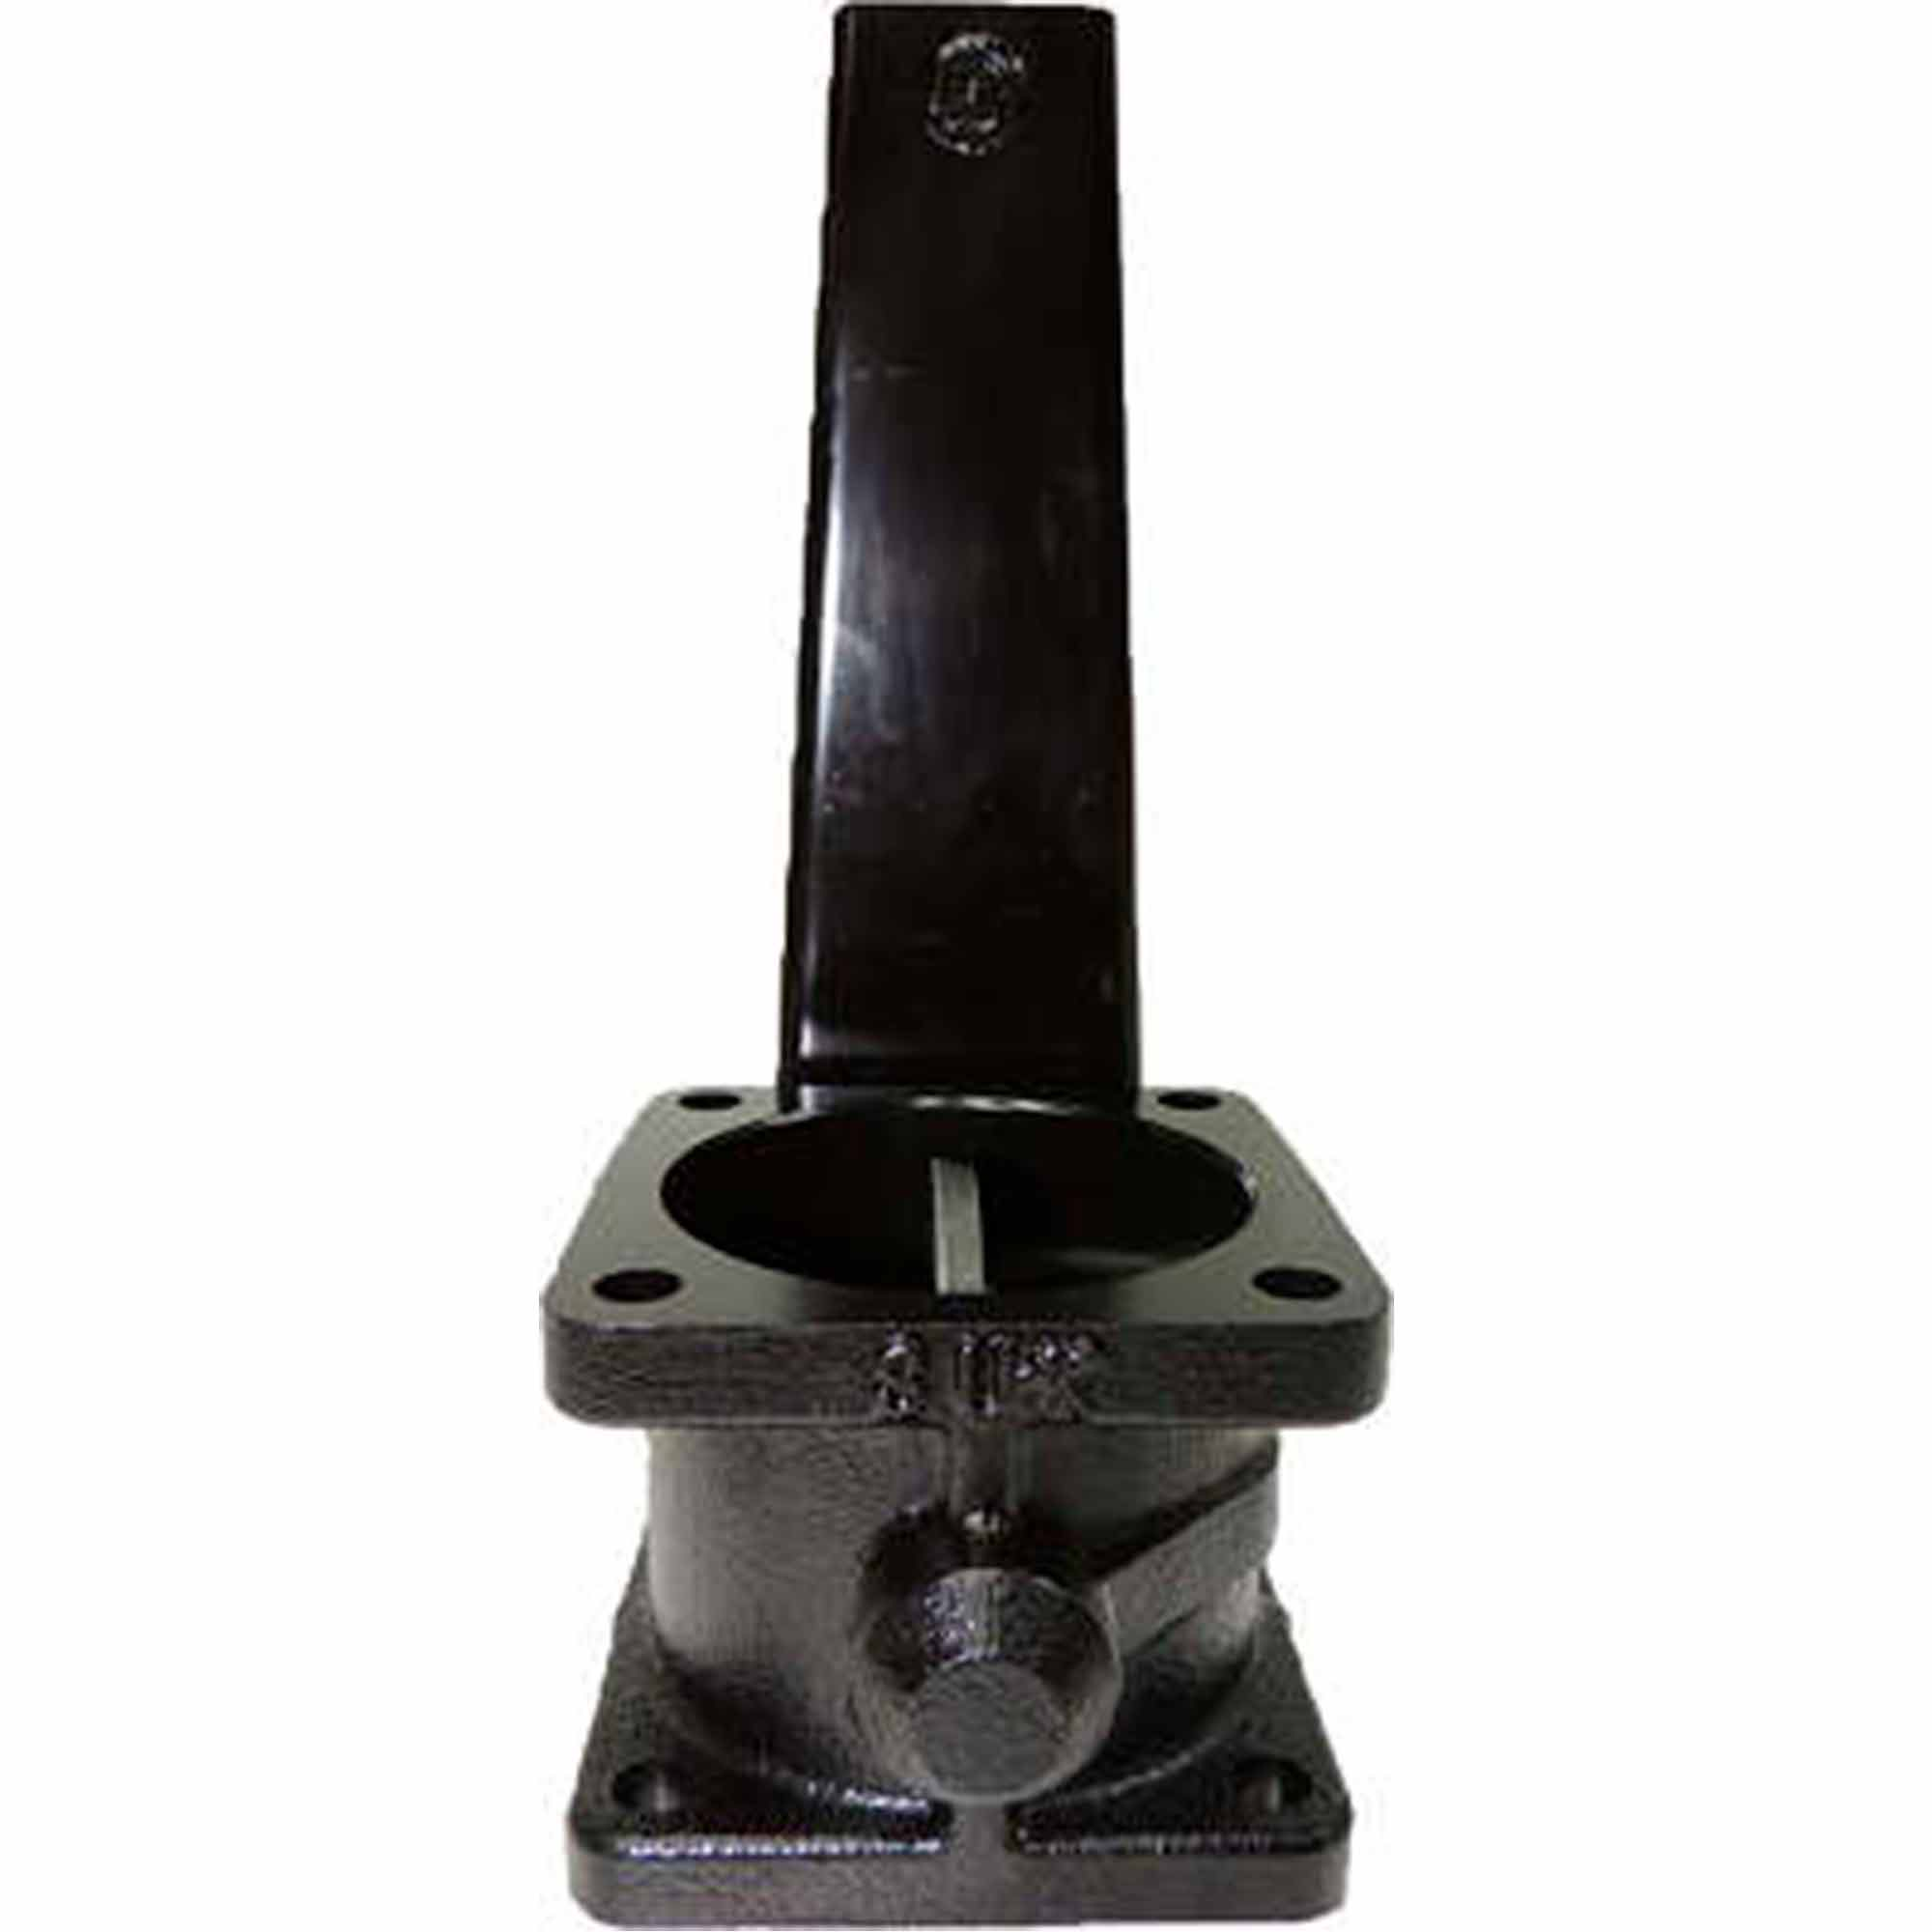 SUK256 -  Conjunto do freio motor 3.1/2